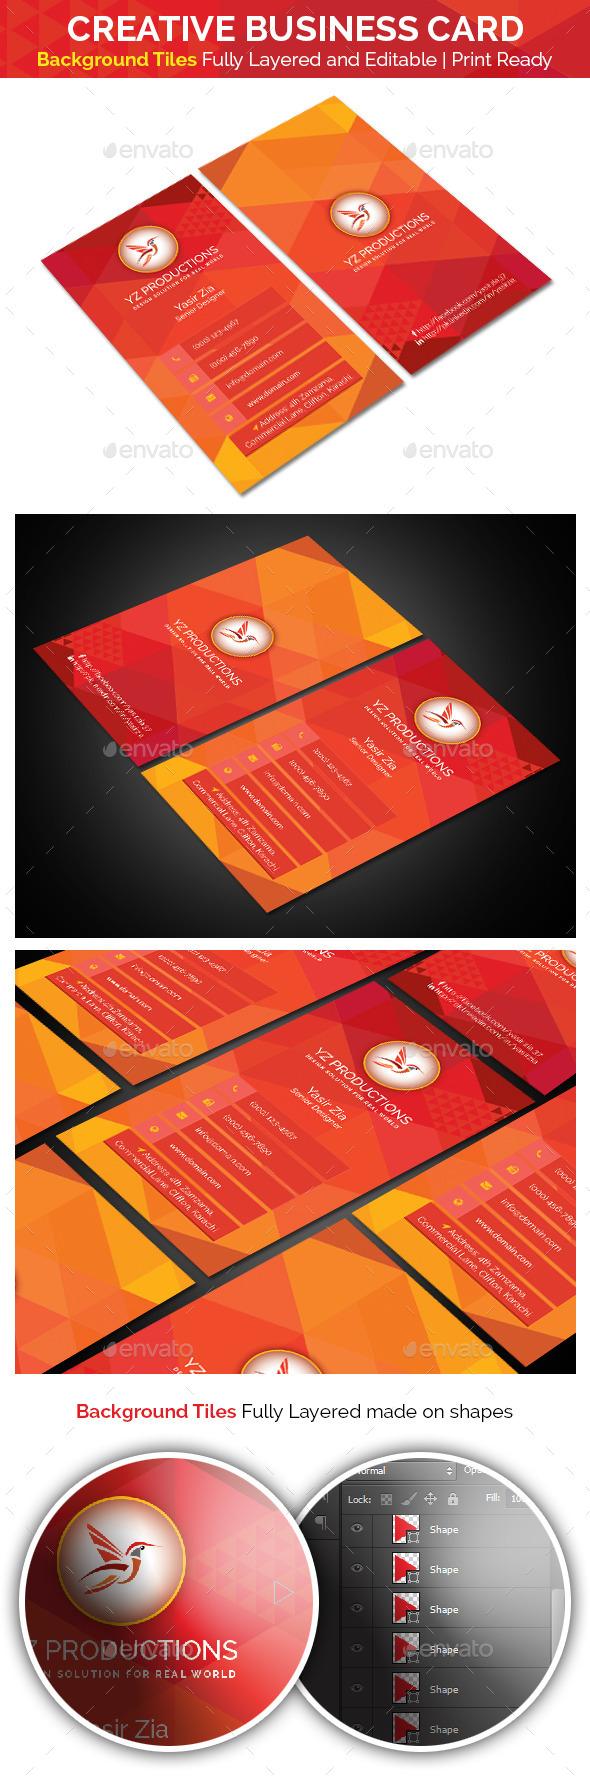 Creative Business Card V-2.0 - Creative Business Cards